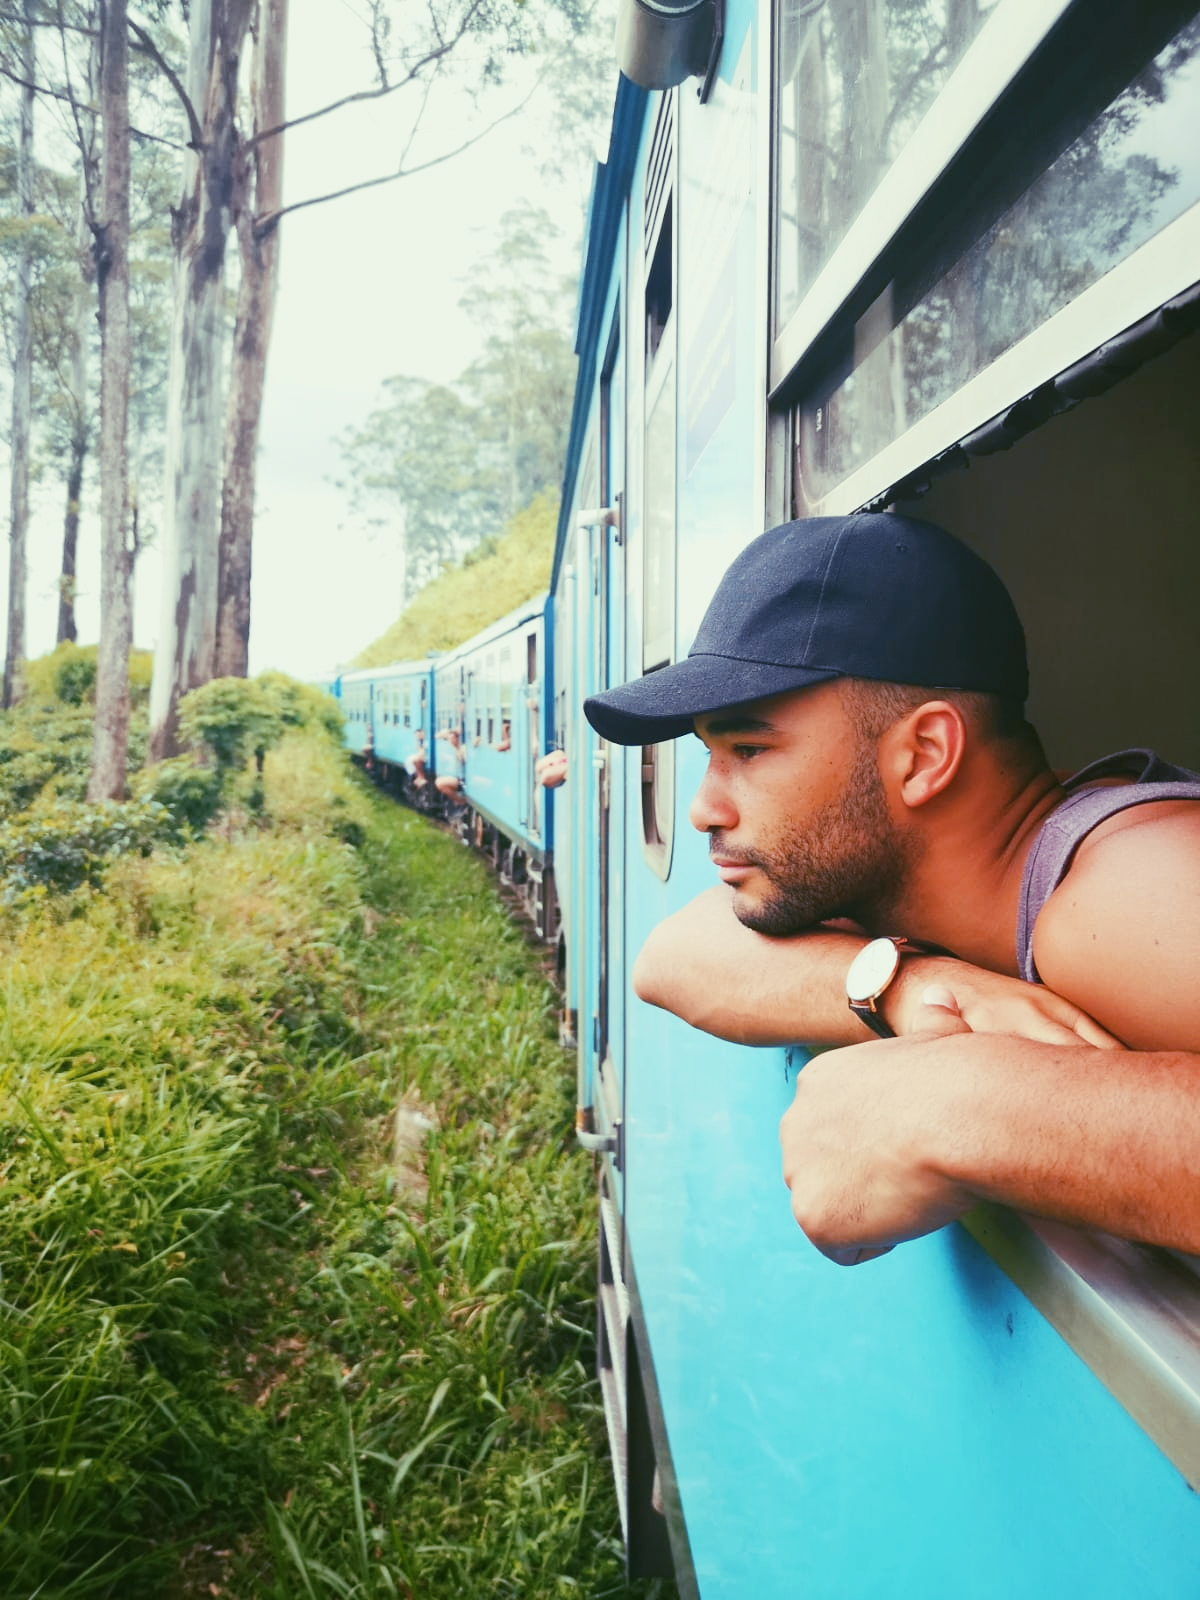 invite-to-paradise-sri-lanka-holiday-honeymoon-specialists-customer-feedback-elin-jordan-luce-train-window.JPG